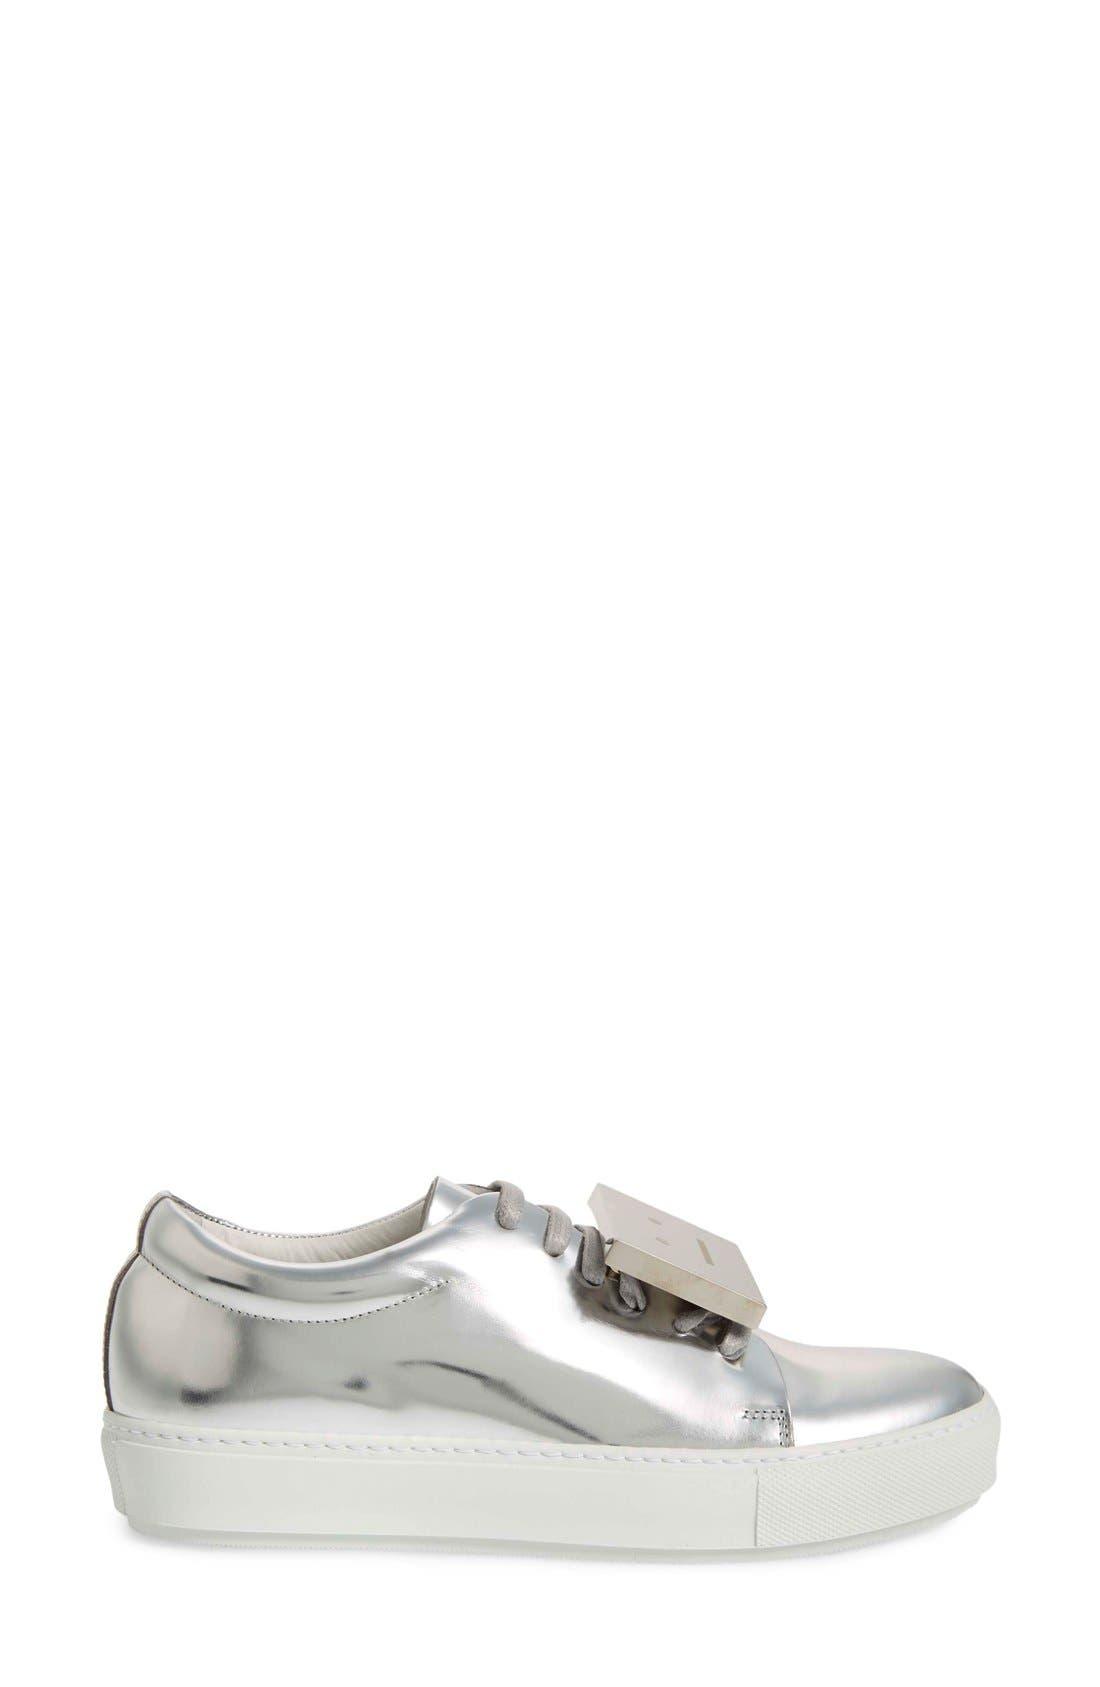 Adriana Silver Metallic Sneaker,                             Alternate thumbnail 4, color,                             044